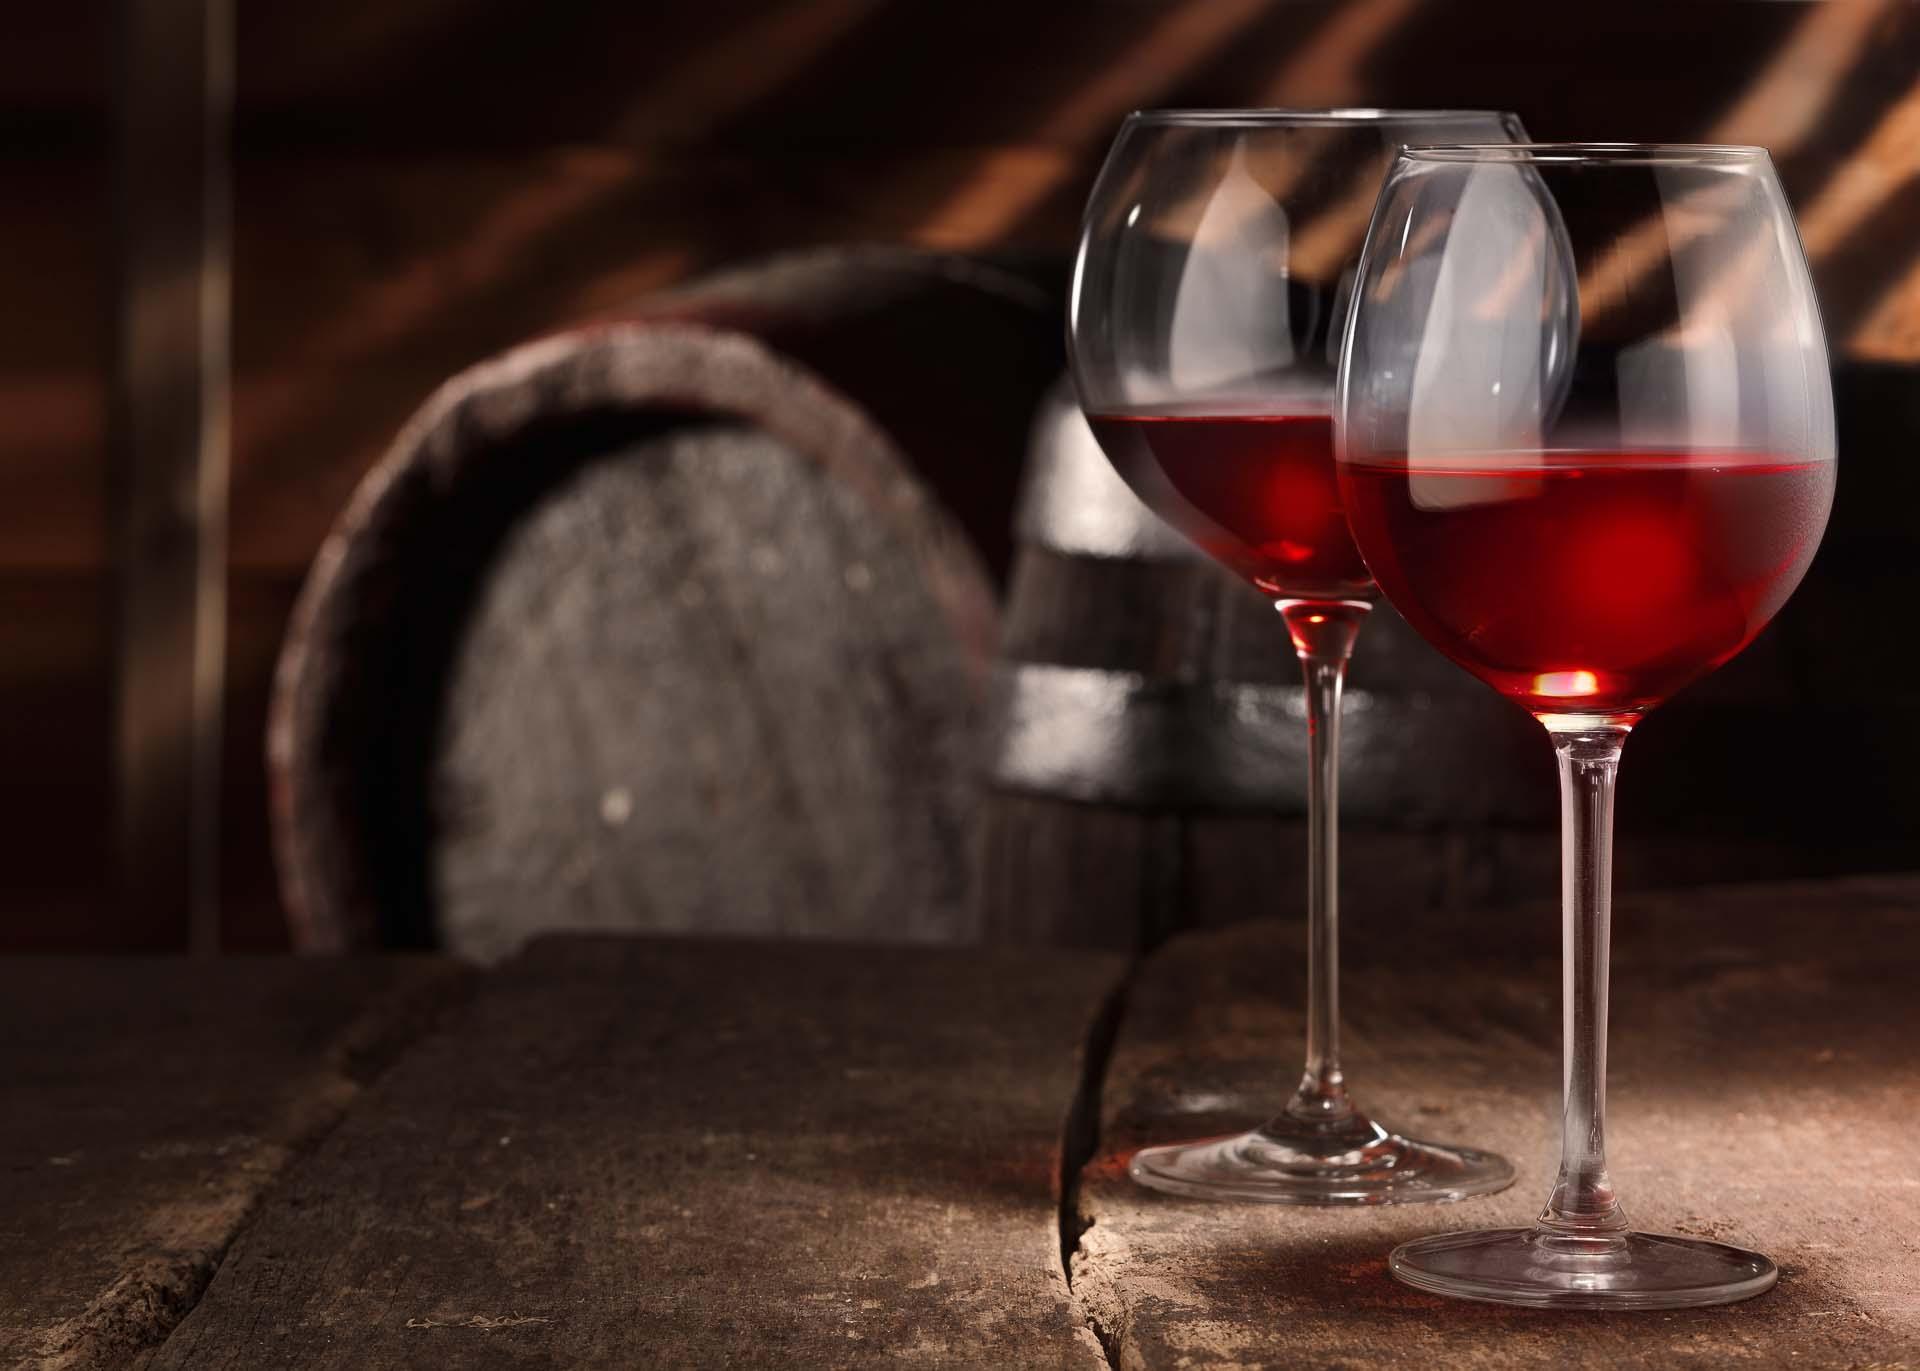 Wine glaesses and barrel